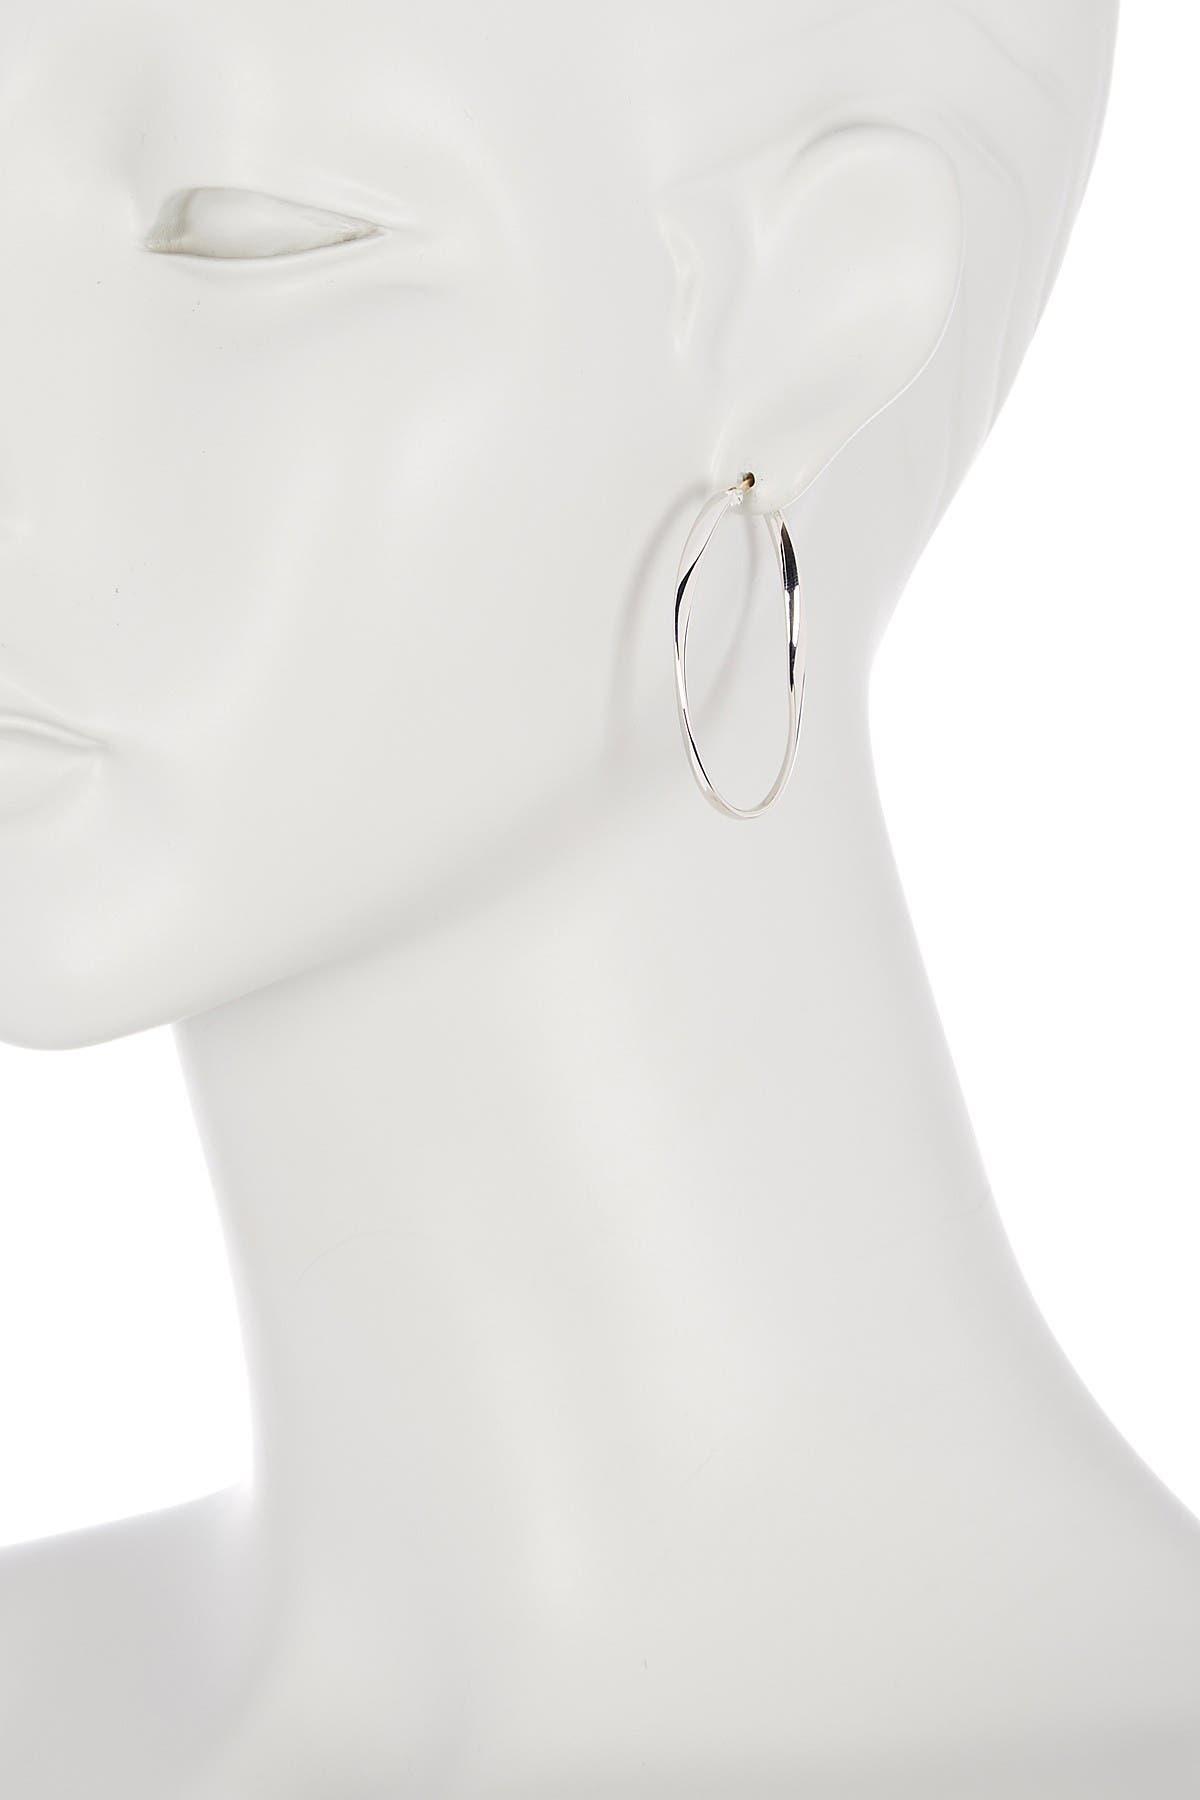 Image of Candela 14K Gold Sterling Silver Findings Oval Twisted Hoop Earrings